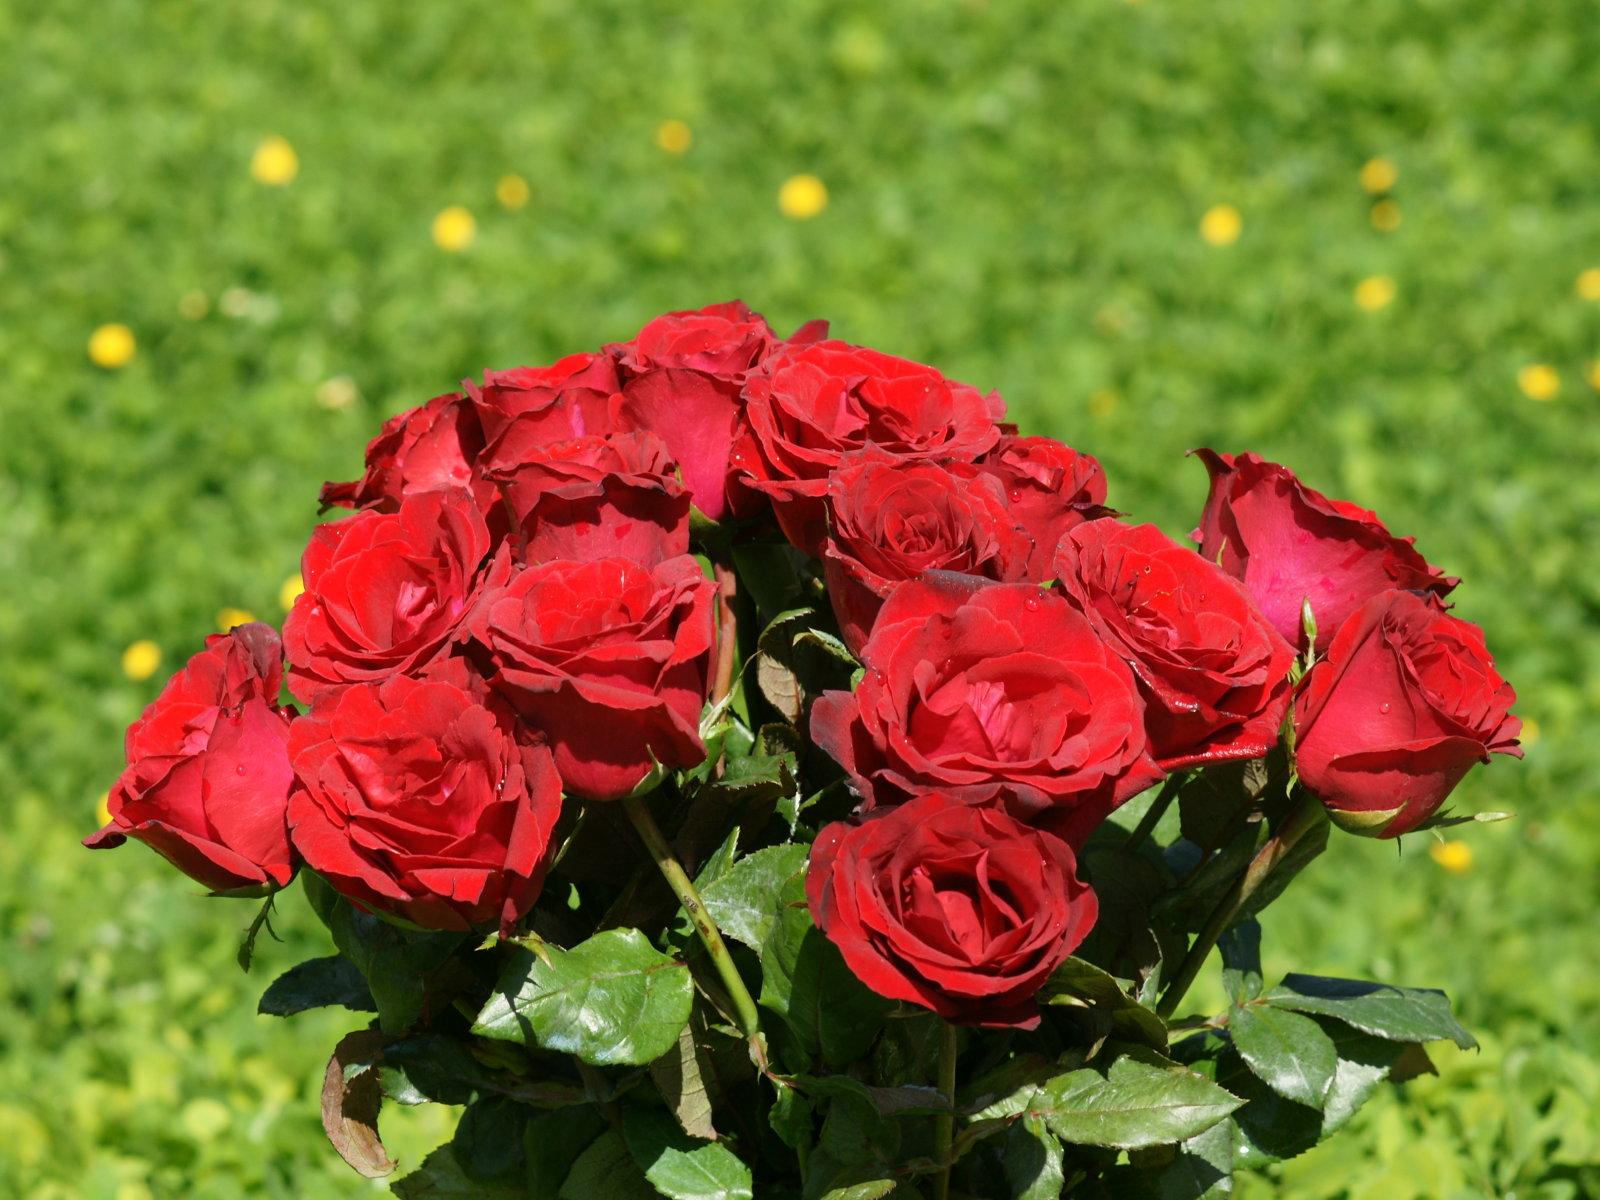 http://4.bp.blogspot.com/-PQ0yVf2dZJc/ToYr4JRBwhI/AAAAAAAAAFw/XVSvKtQzNEs/s1600/red+rose+wallpapers+4.jpg